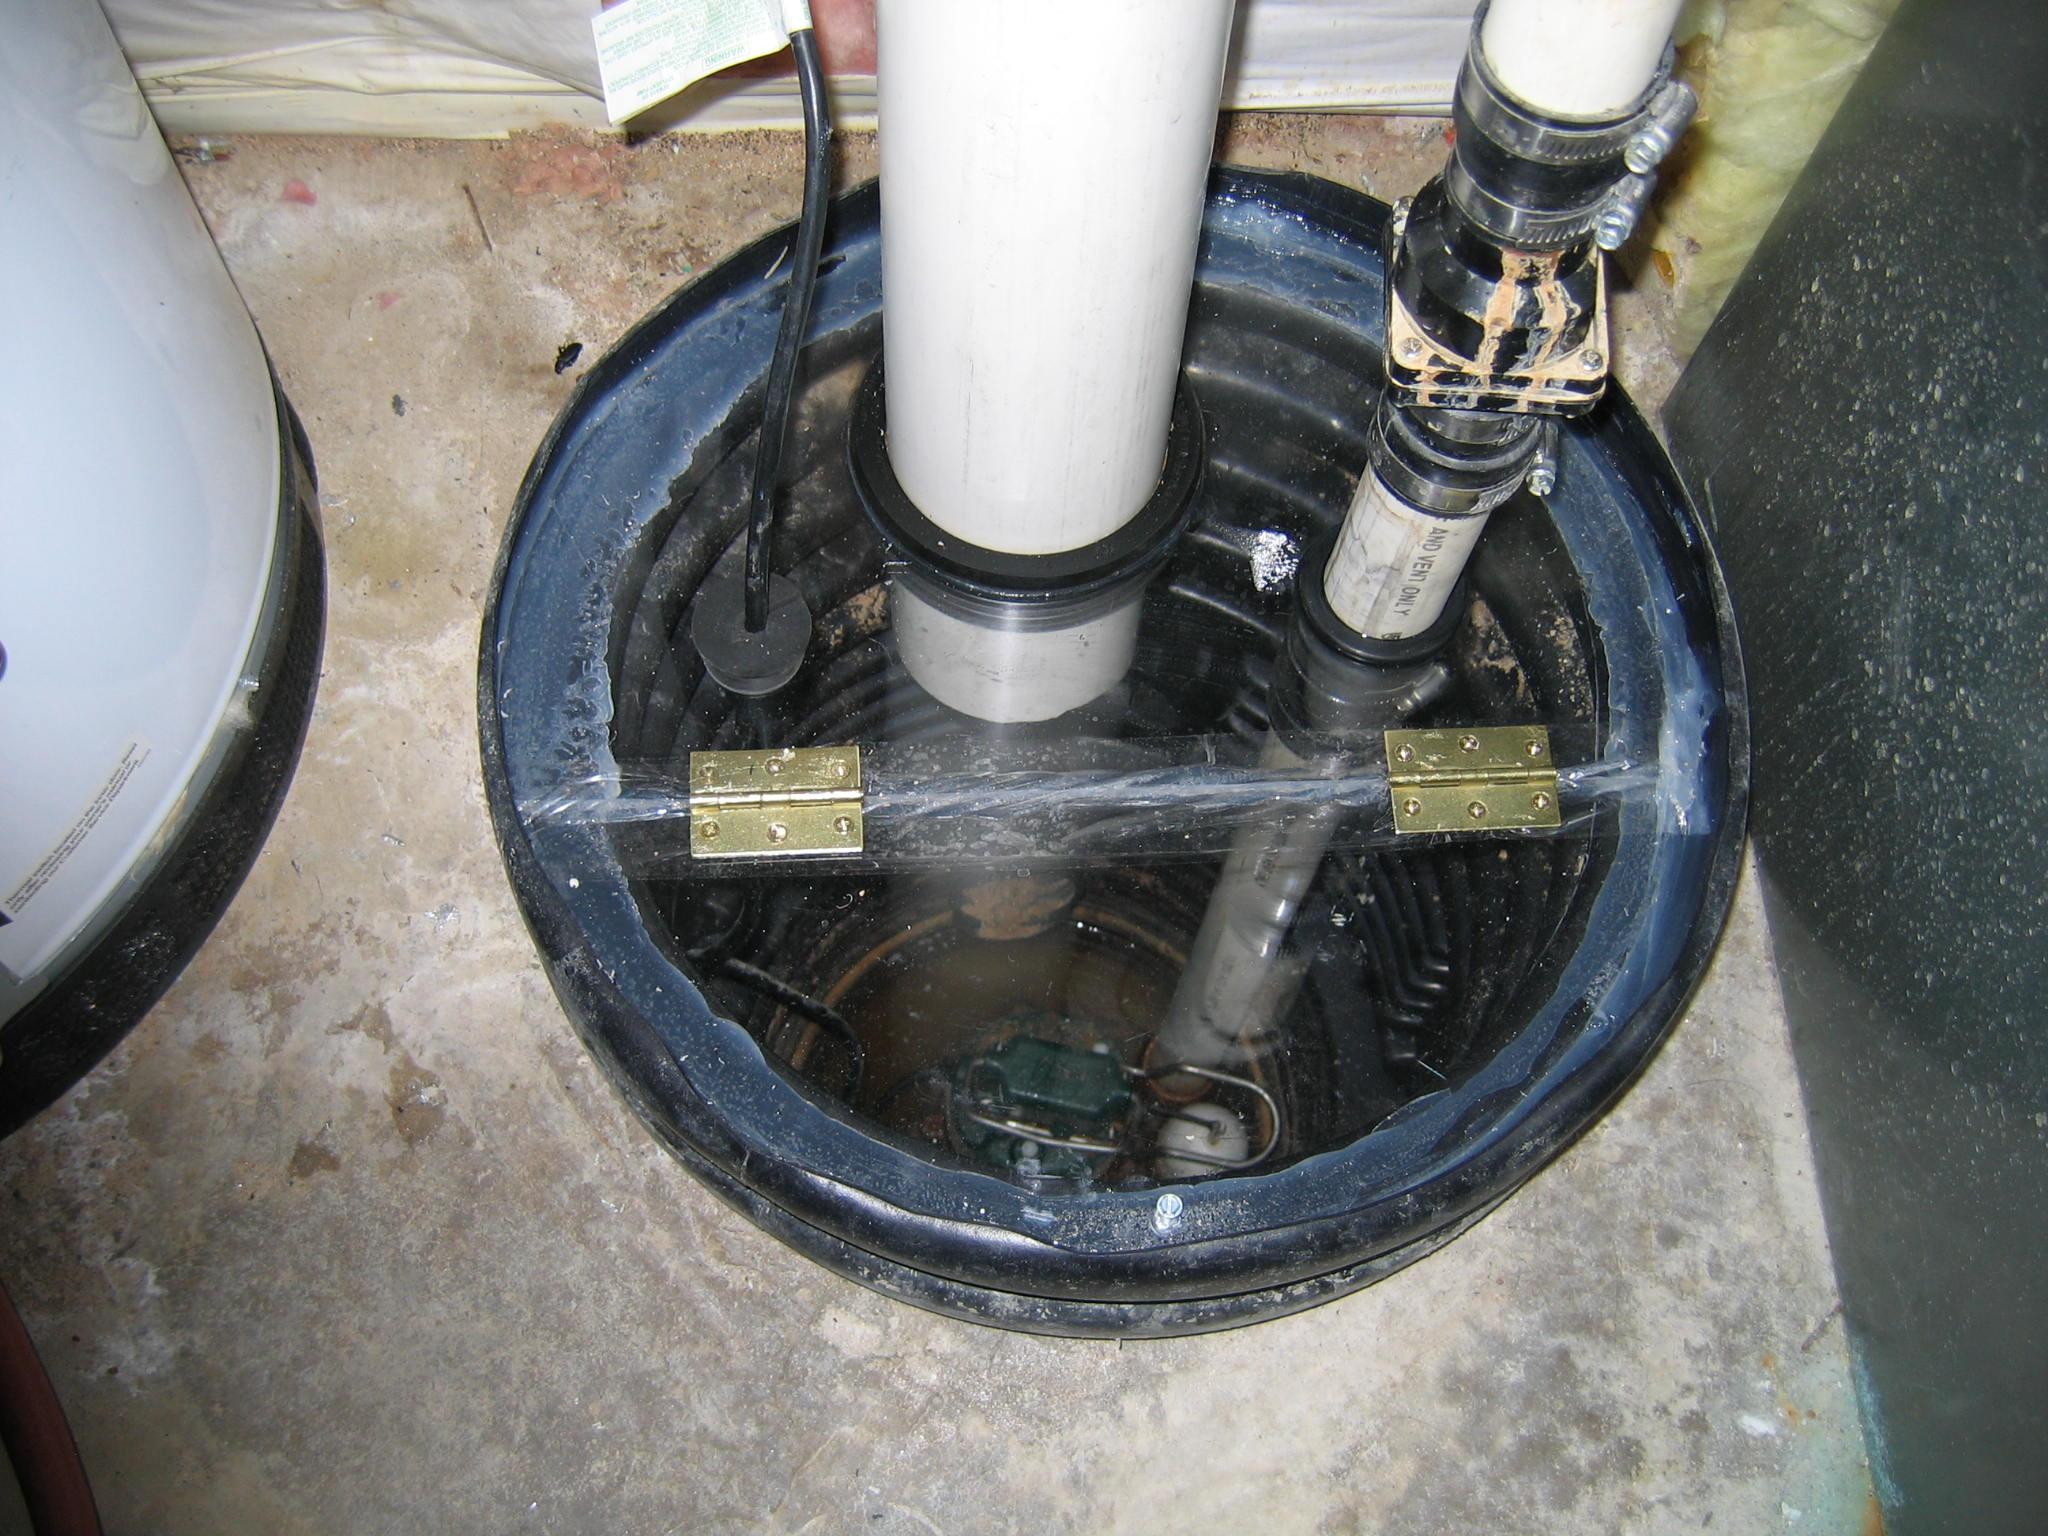 Sump Pump Radon Sump Pump Cover